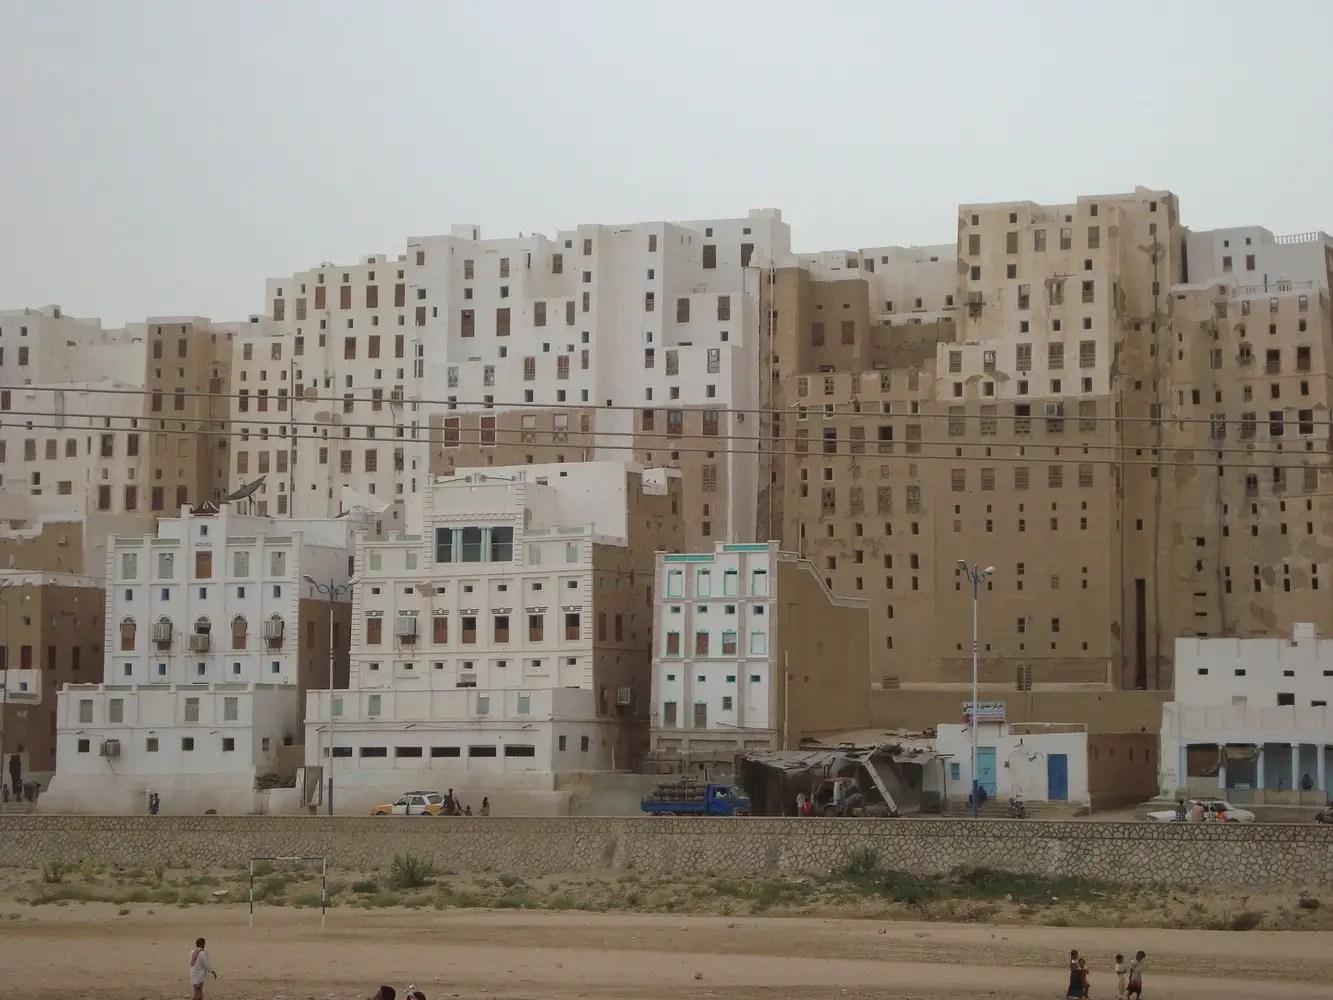 Shibam, Yemen